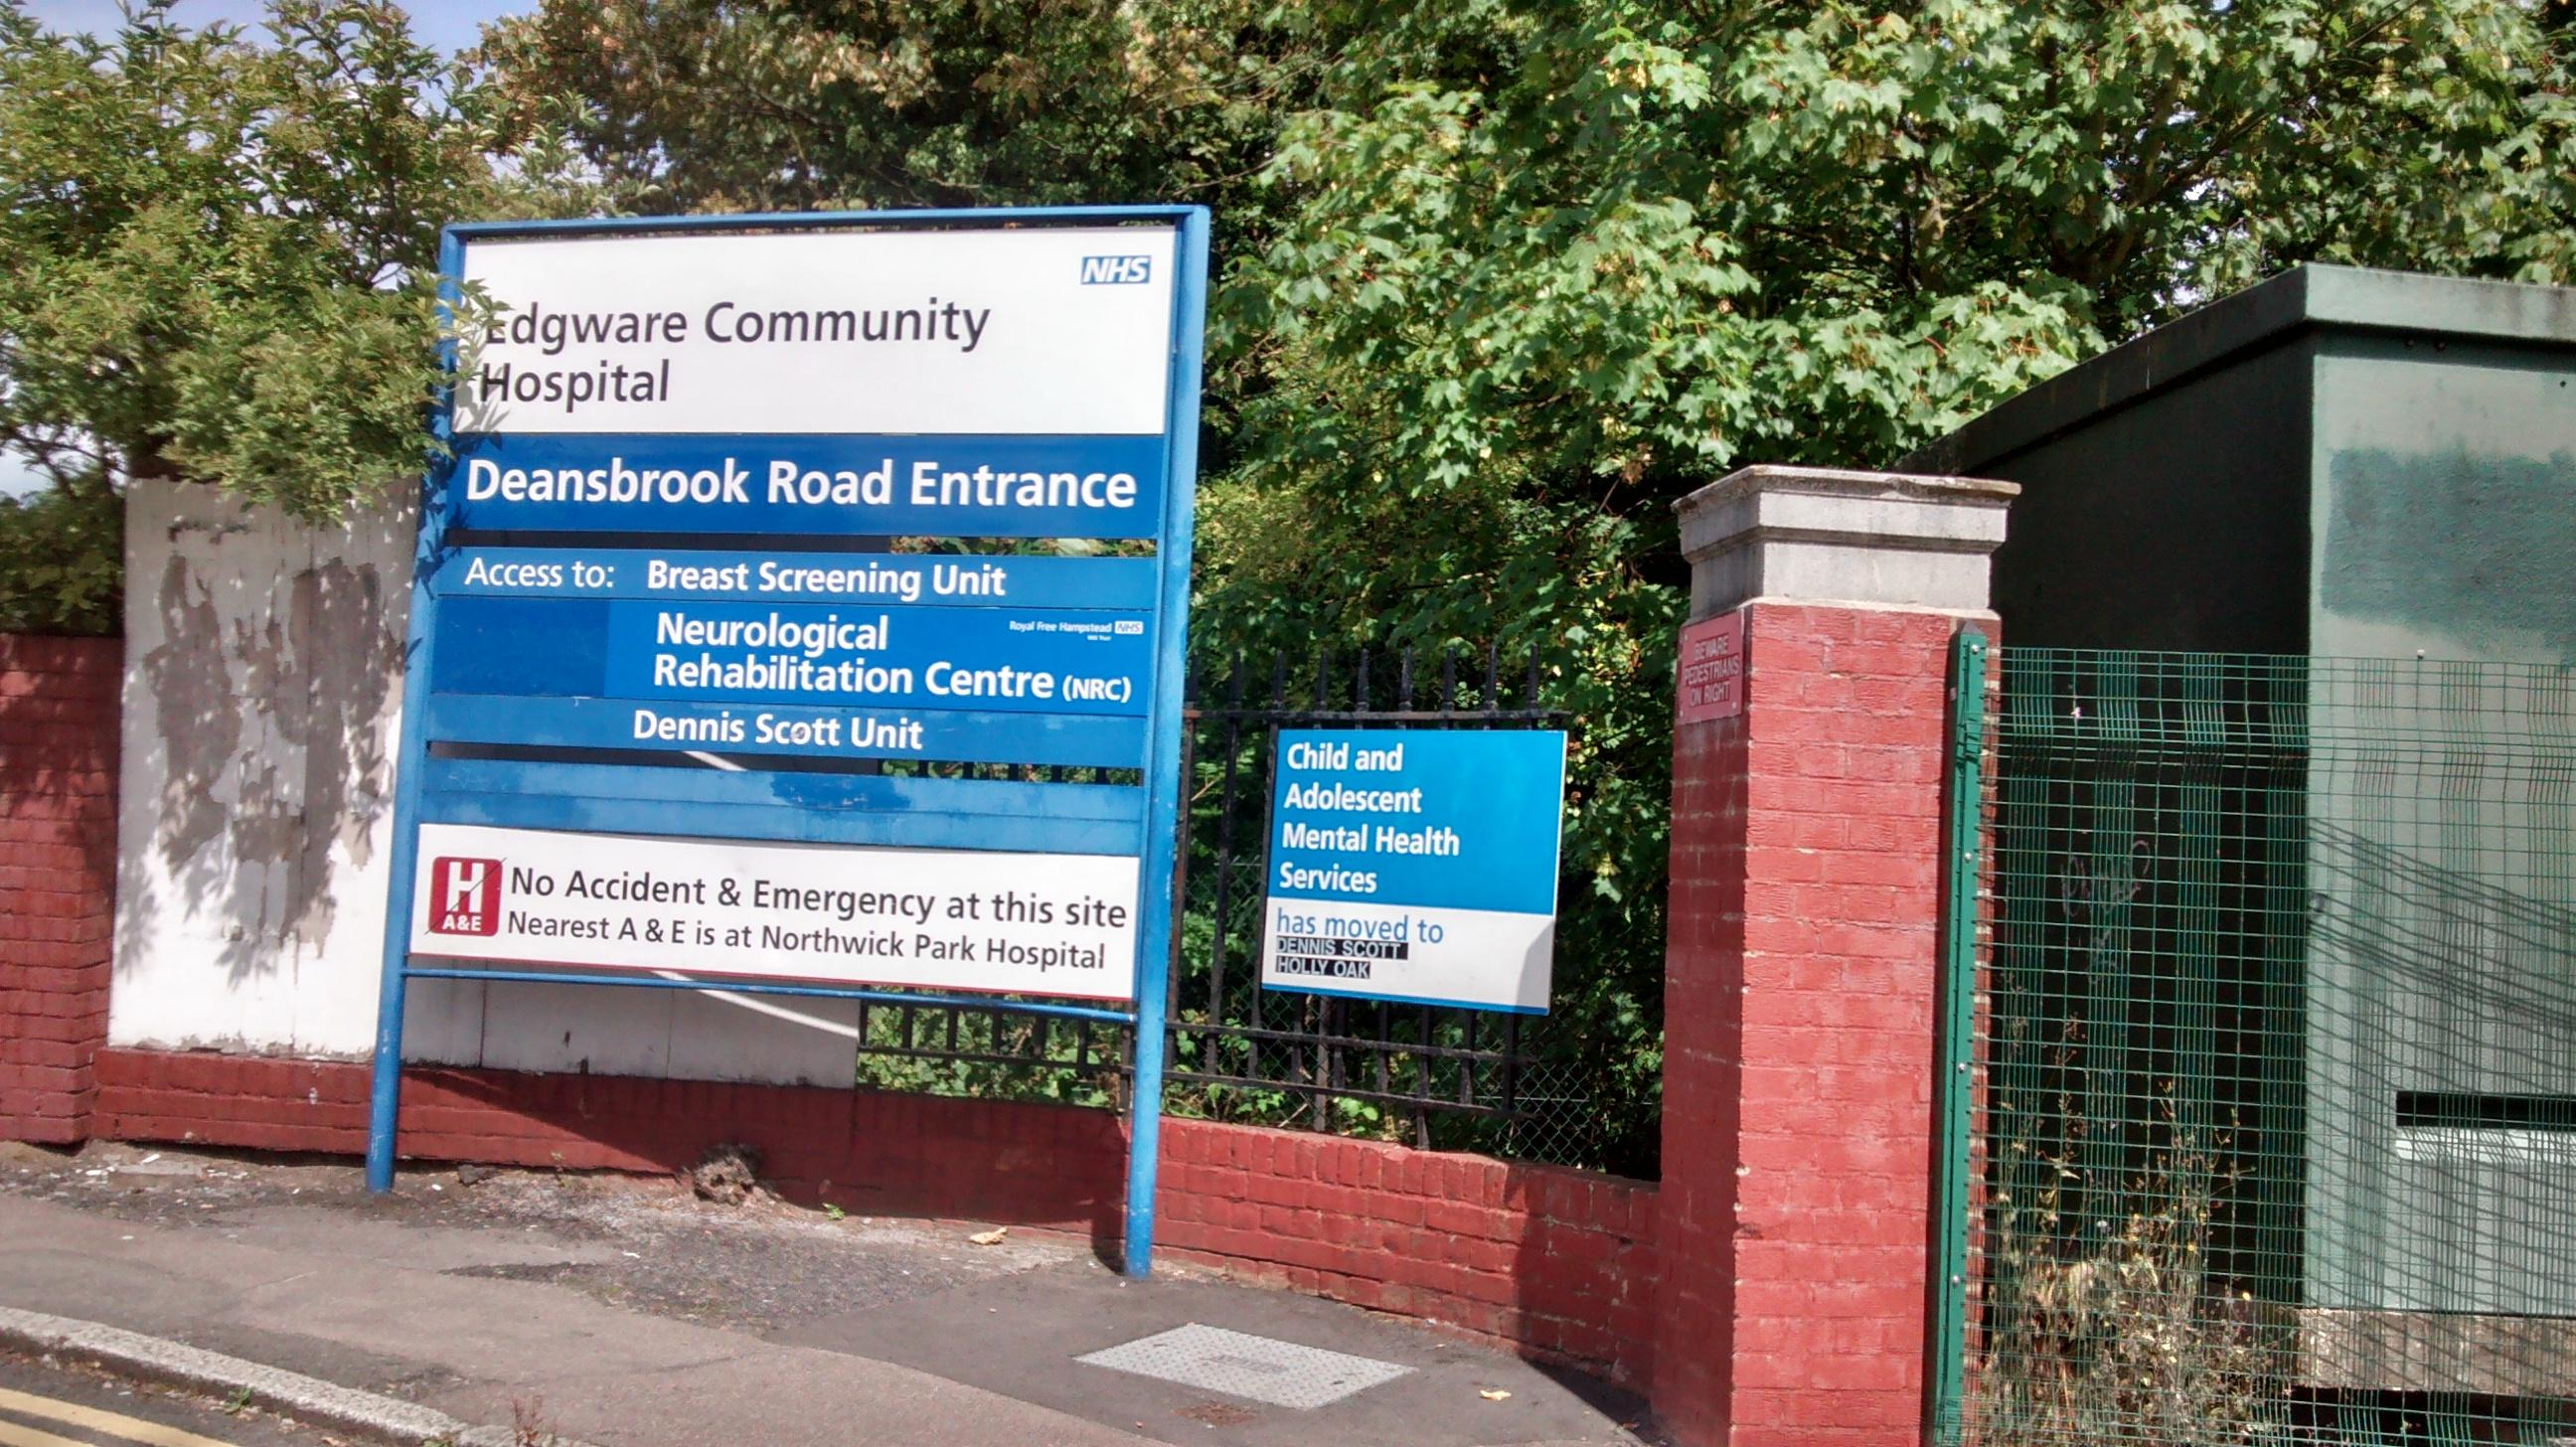 Edgware Community